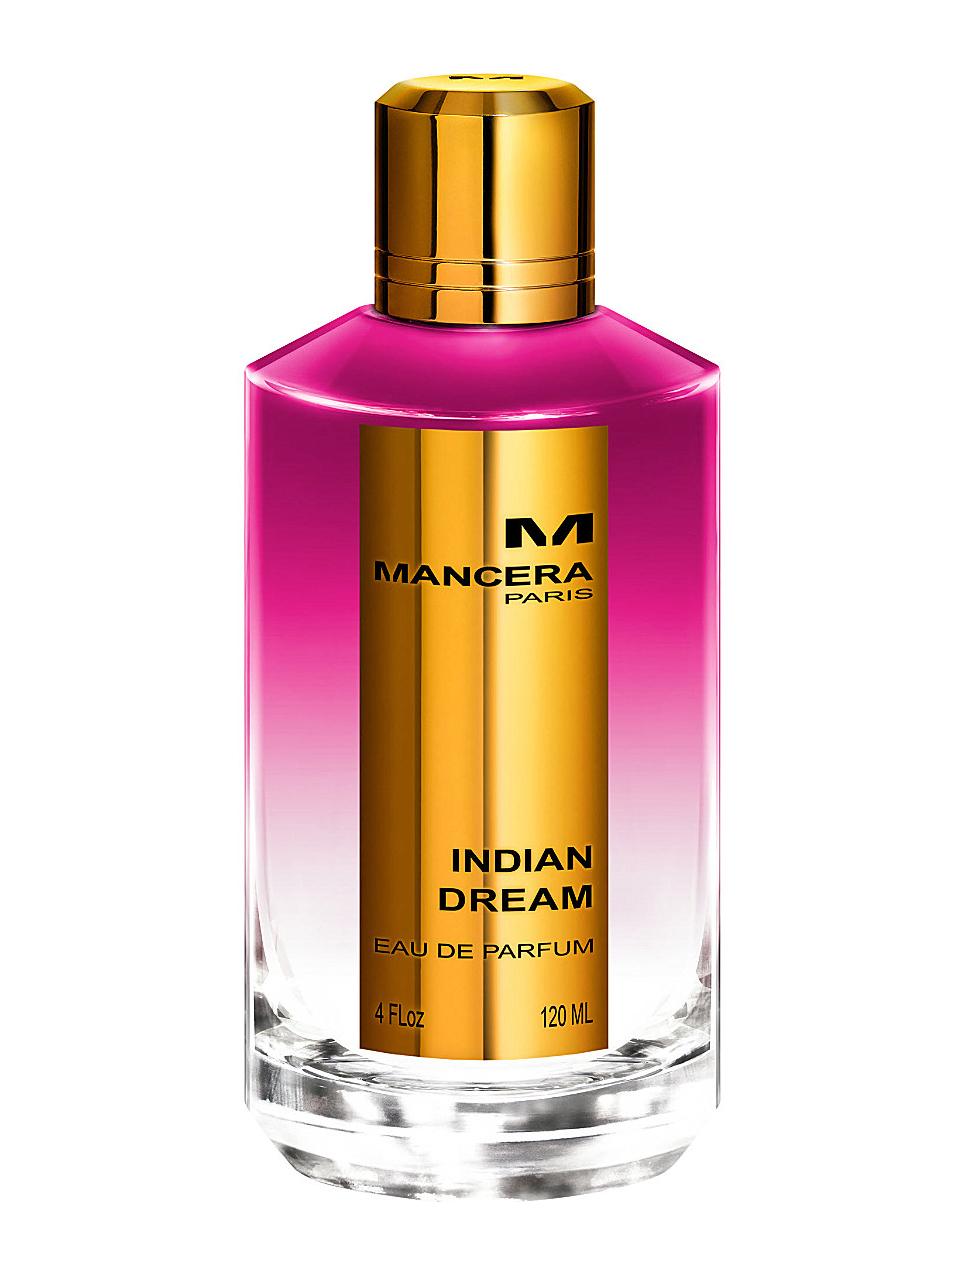 indian dream mancera perfume a fragrance for women 2014. Black Bedroom Furniture Sets. Home Design Ideas